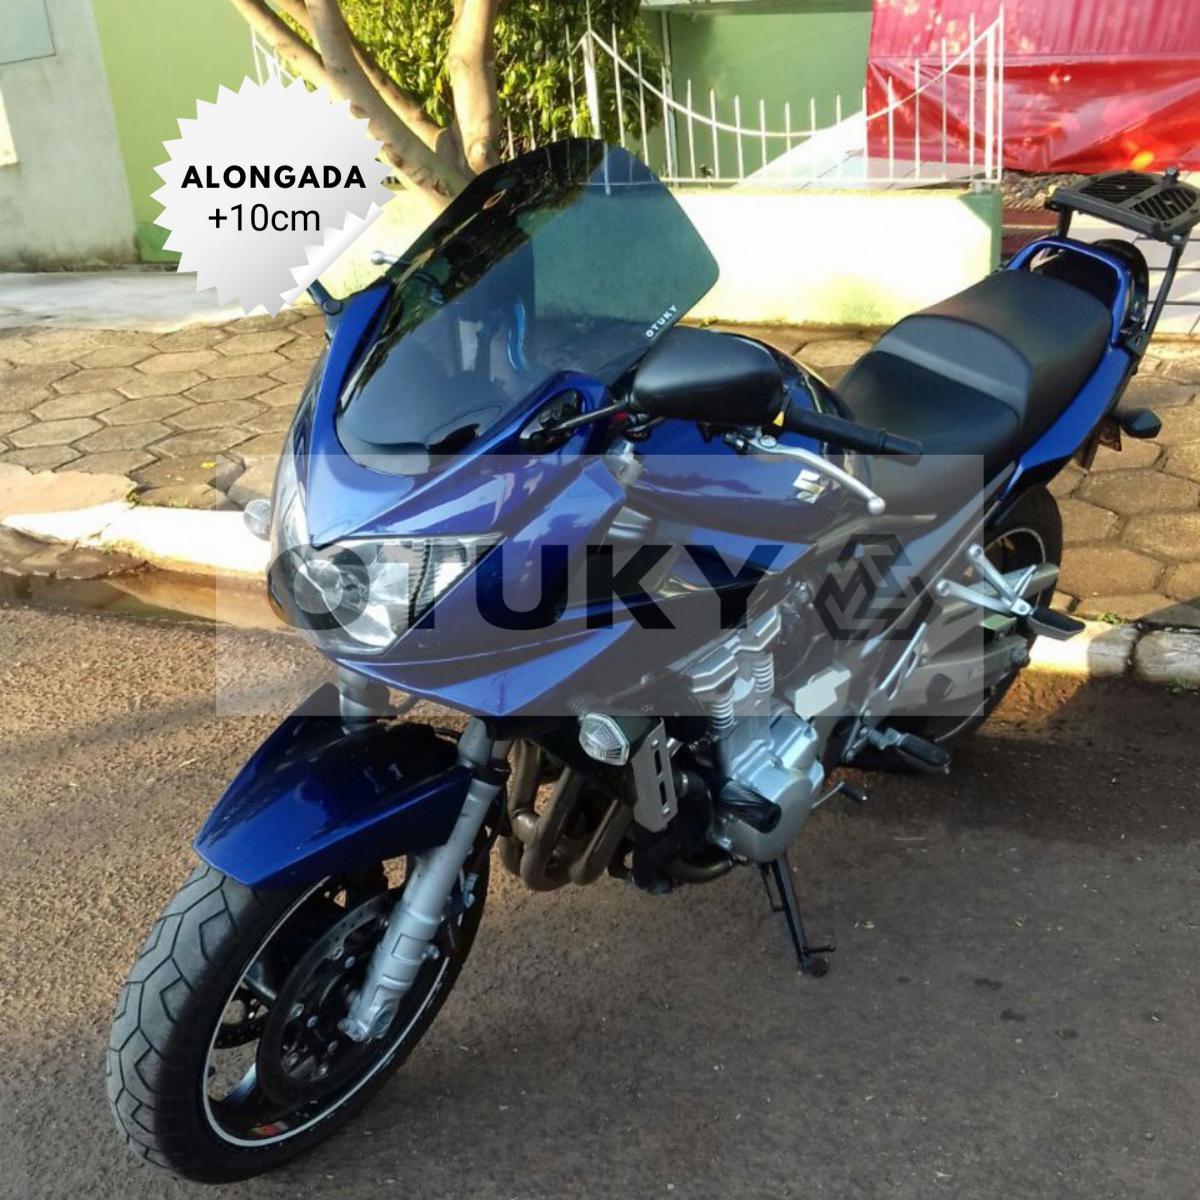 Bolha para Moto Bandit 650 S 2005 2006 2007 2008 2009 2010 Alongada +10cm